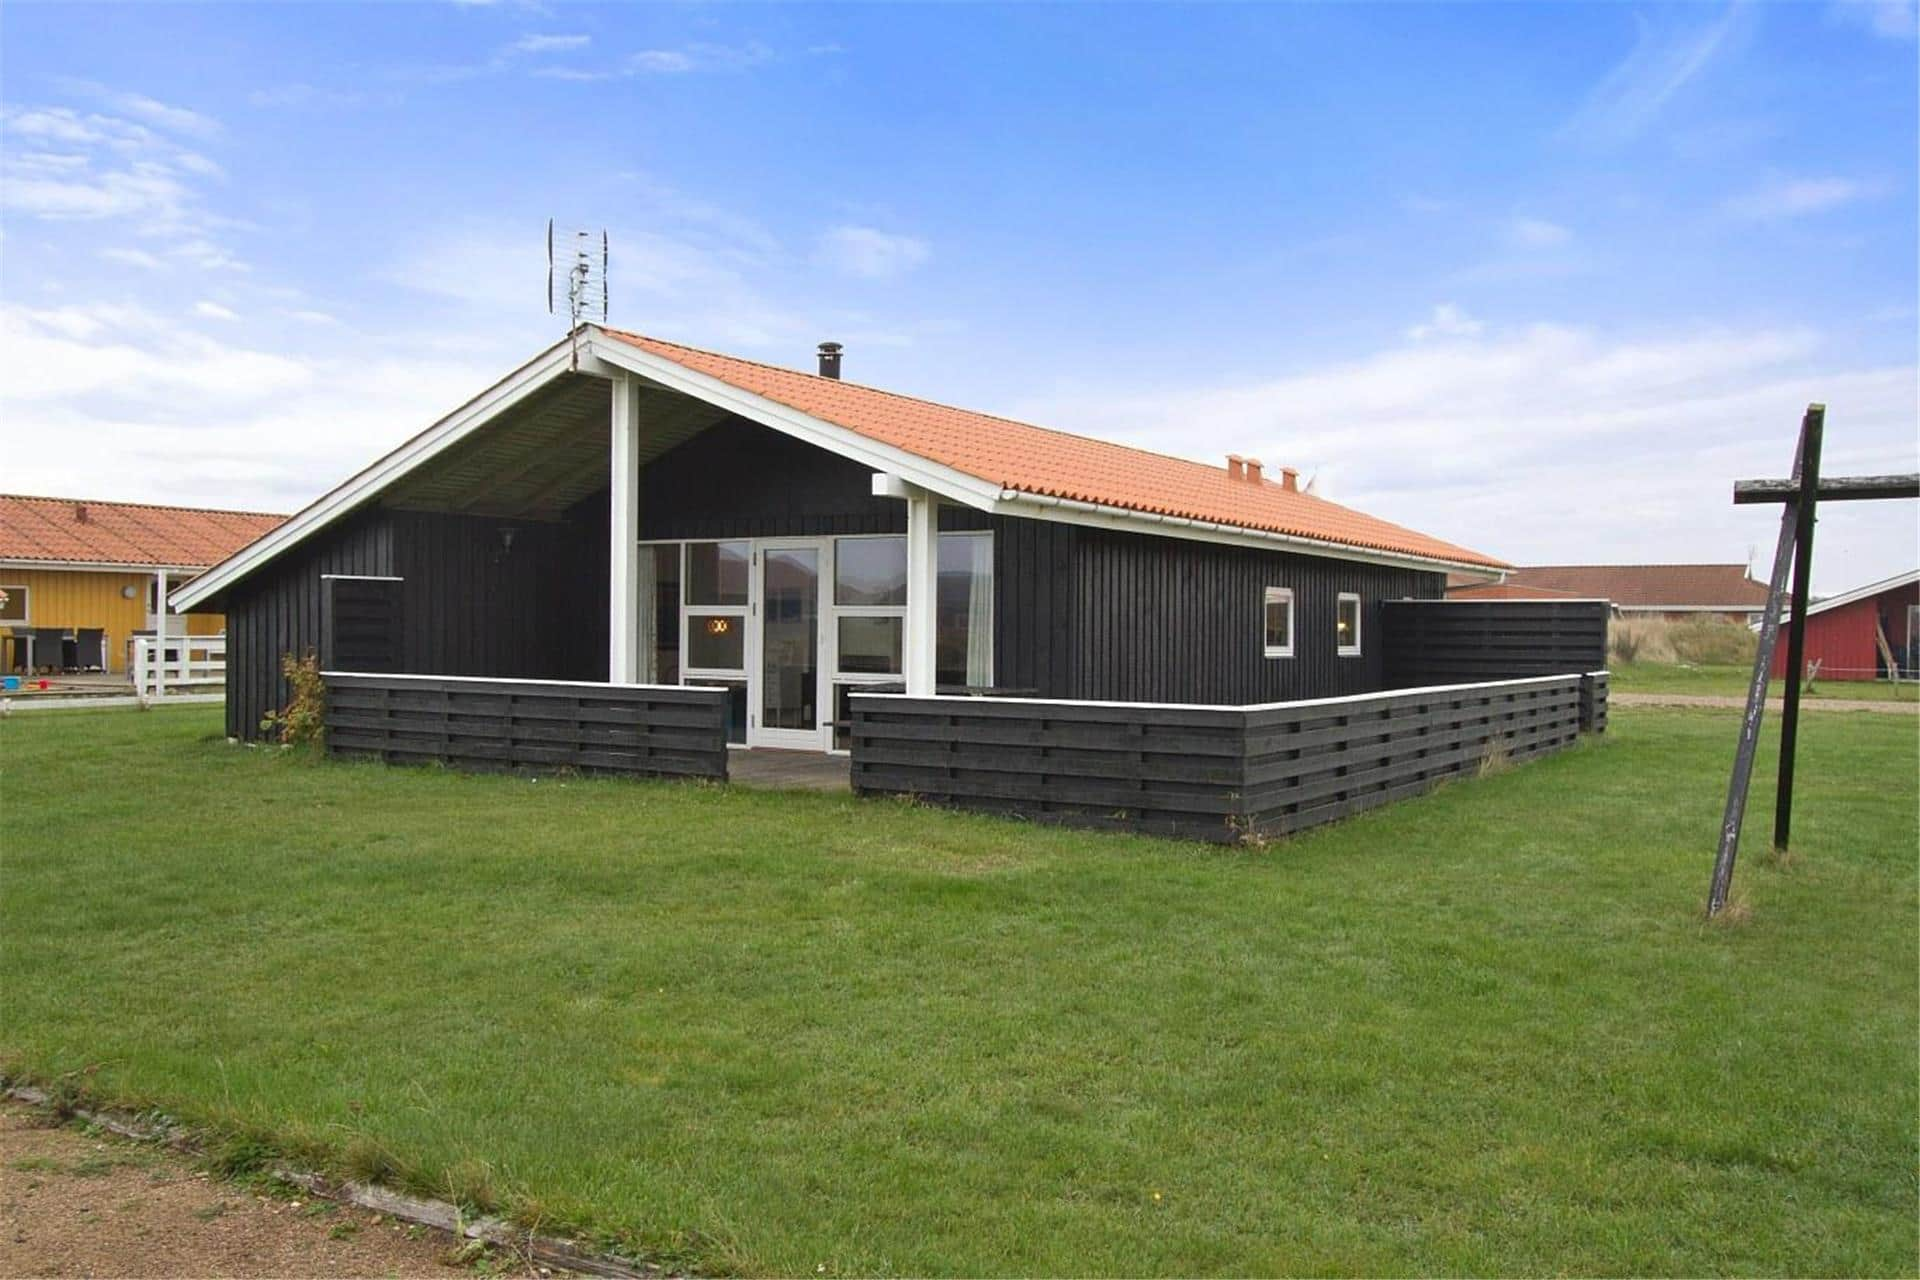 Bilde 1-20 Feirehus 172, Vejlby Klit 155, DK - 7673 Harboøre